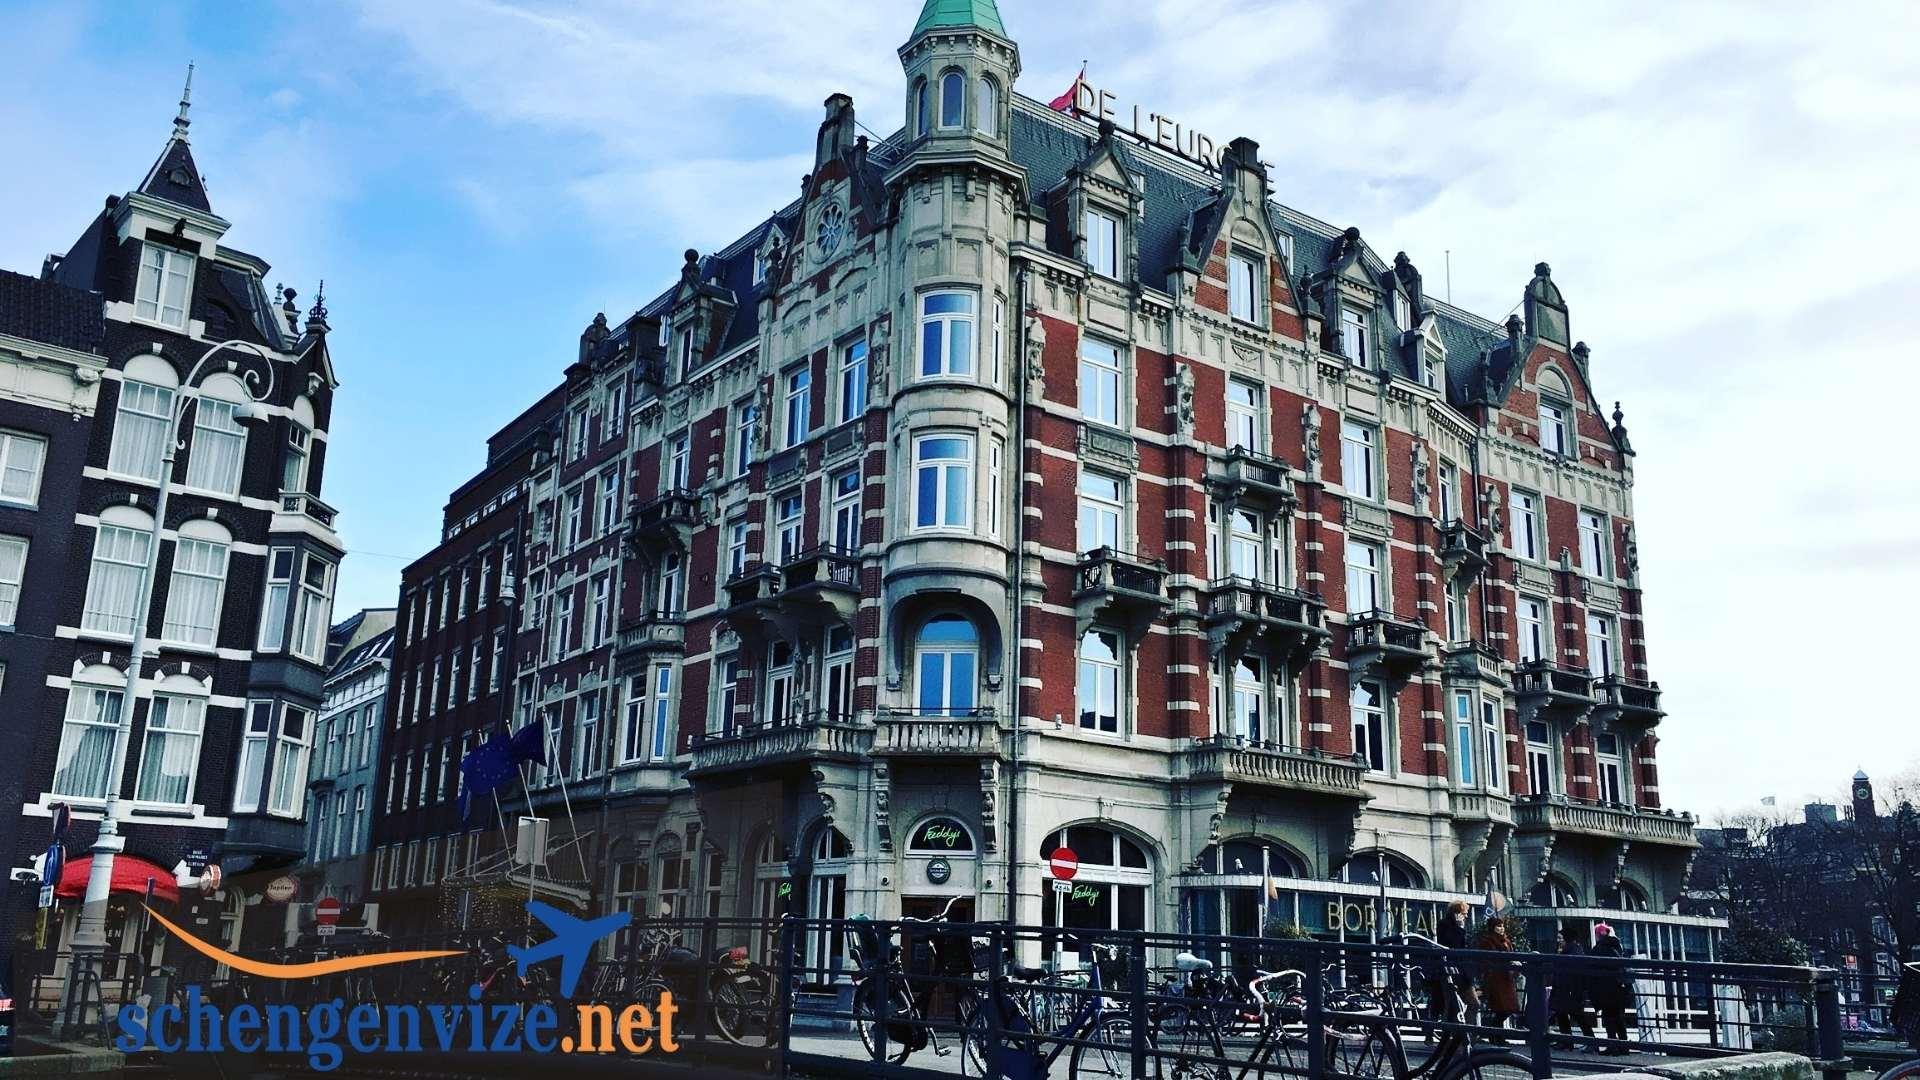 Hollanda Turistik Vize-Schengen Vize